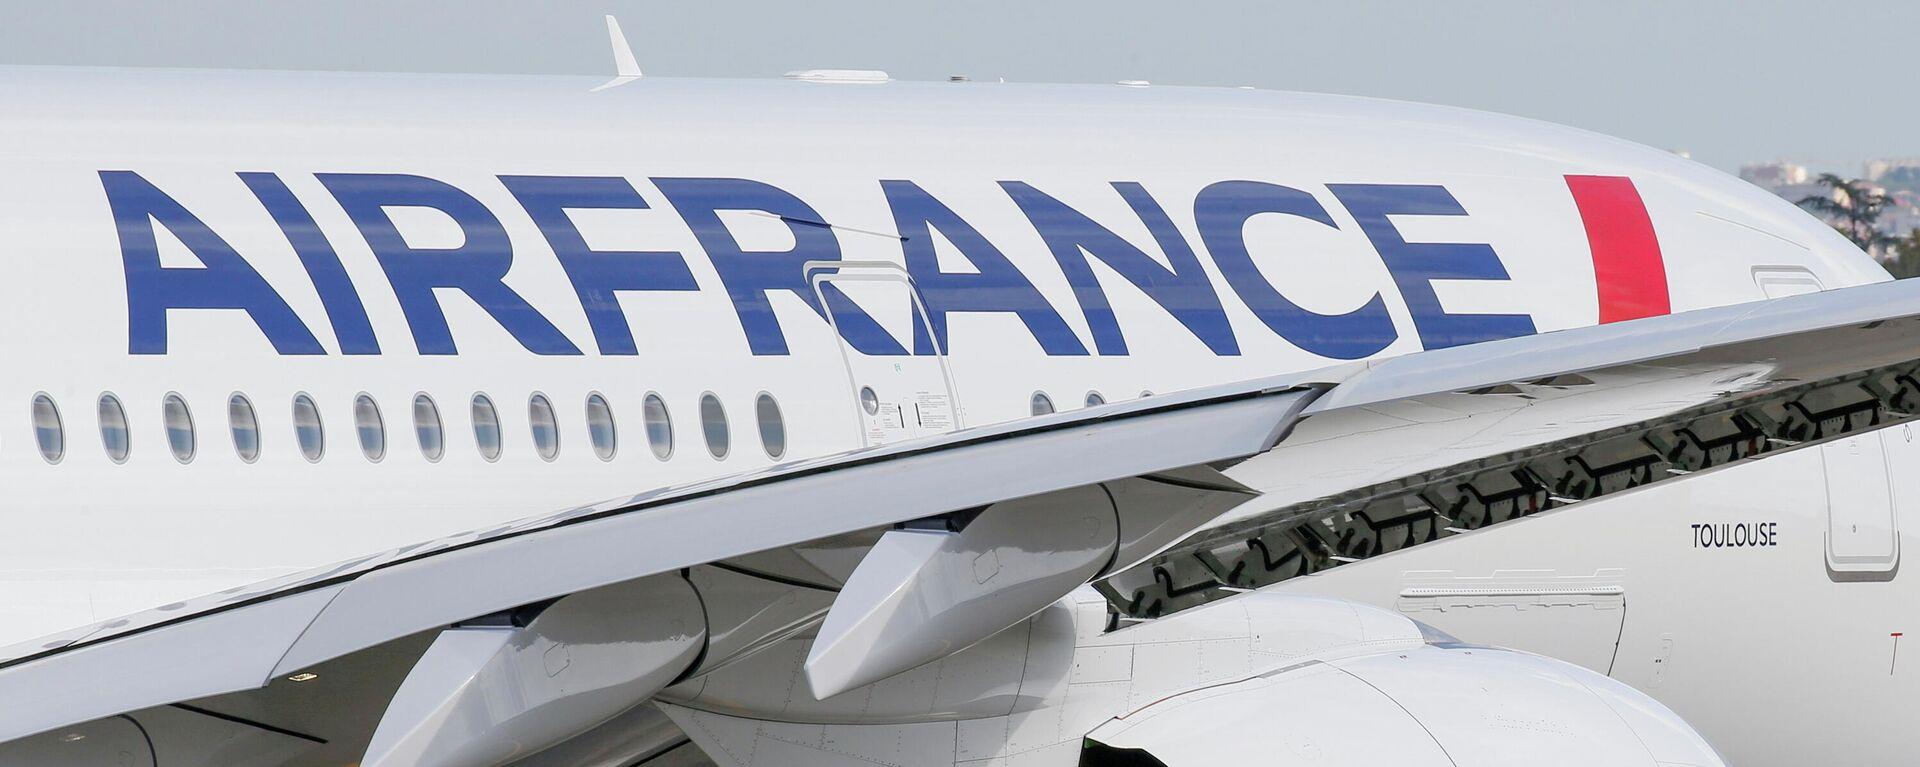 Die Fluggesellschaft Air France ( Airbus A350) - SNA, 1920, 25.05.2021